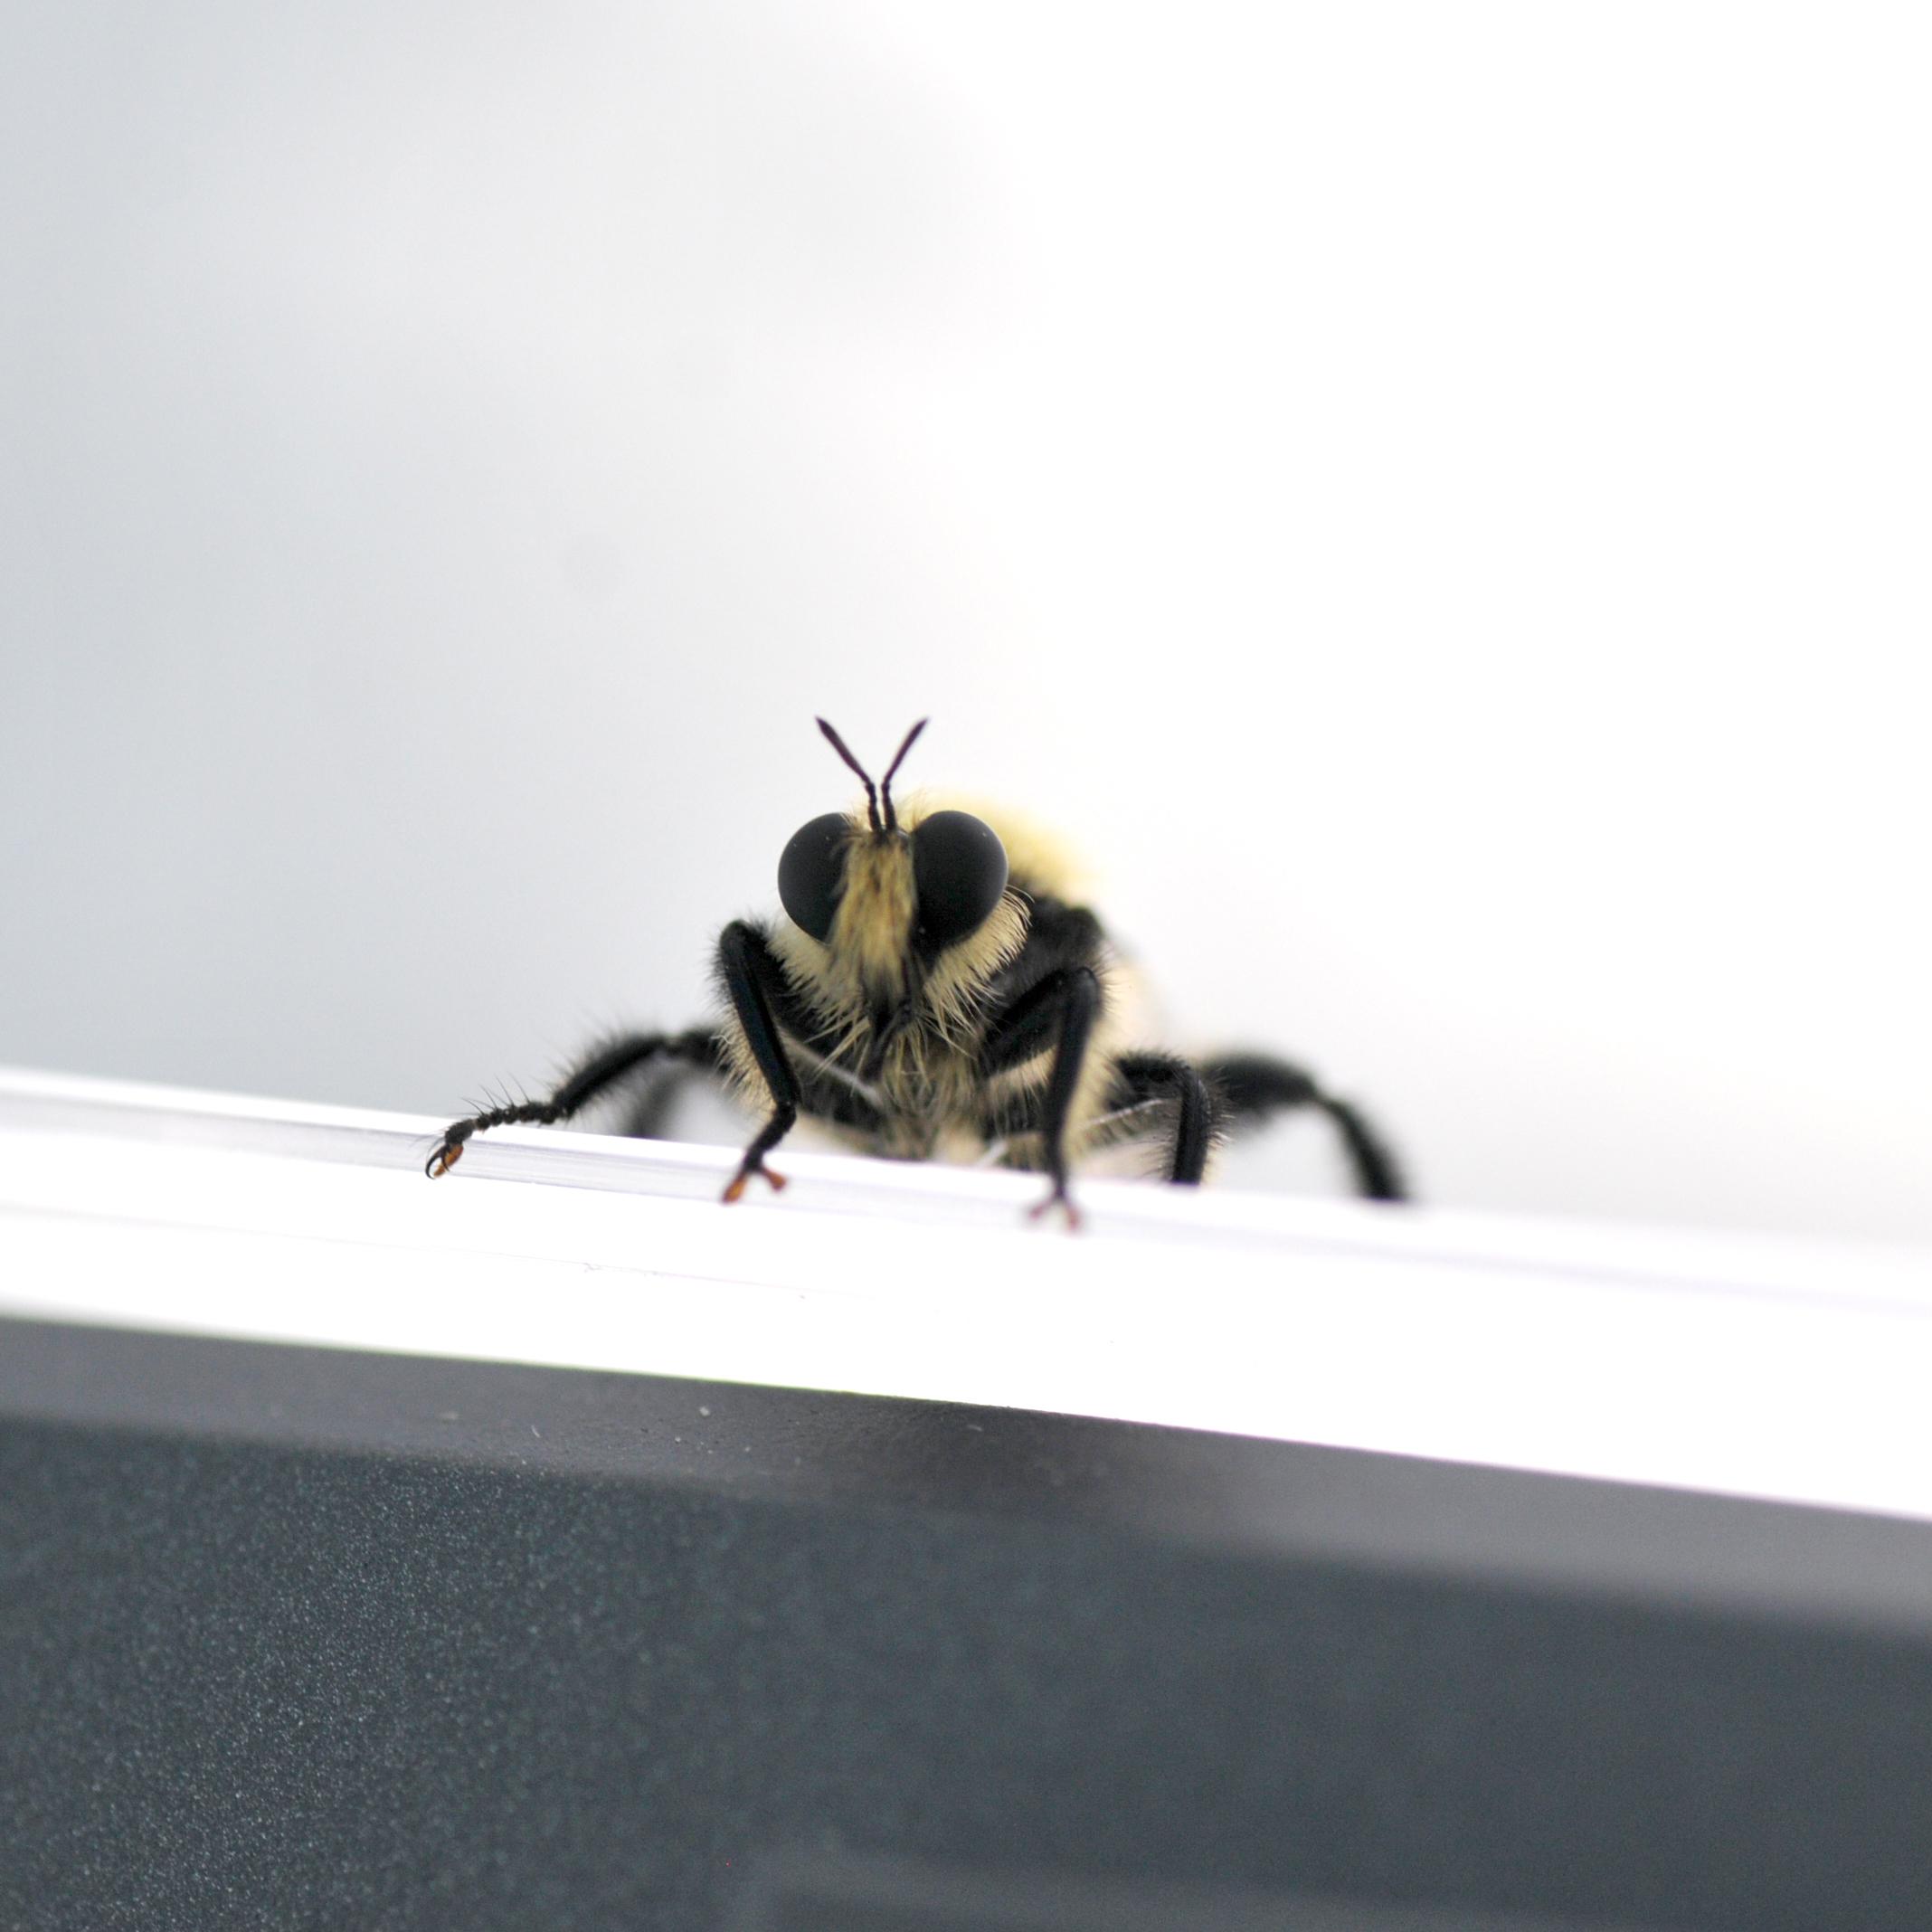 Robber fly (aka assassin flies)